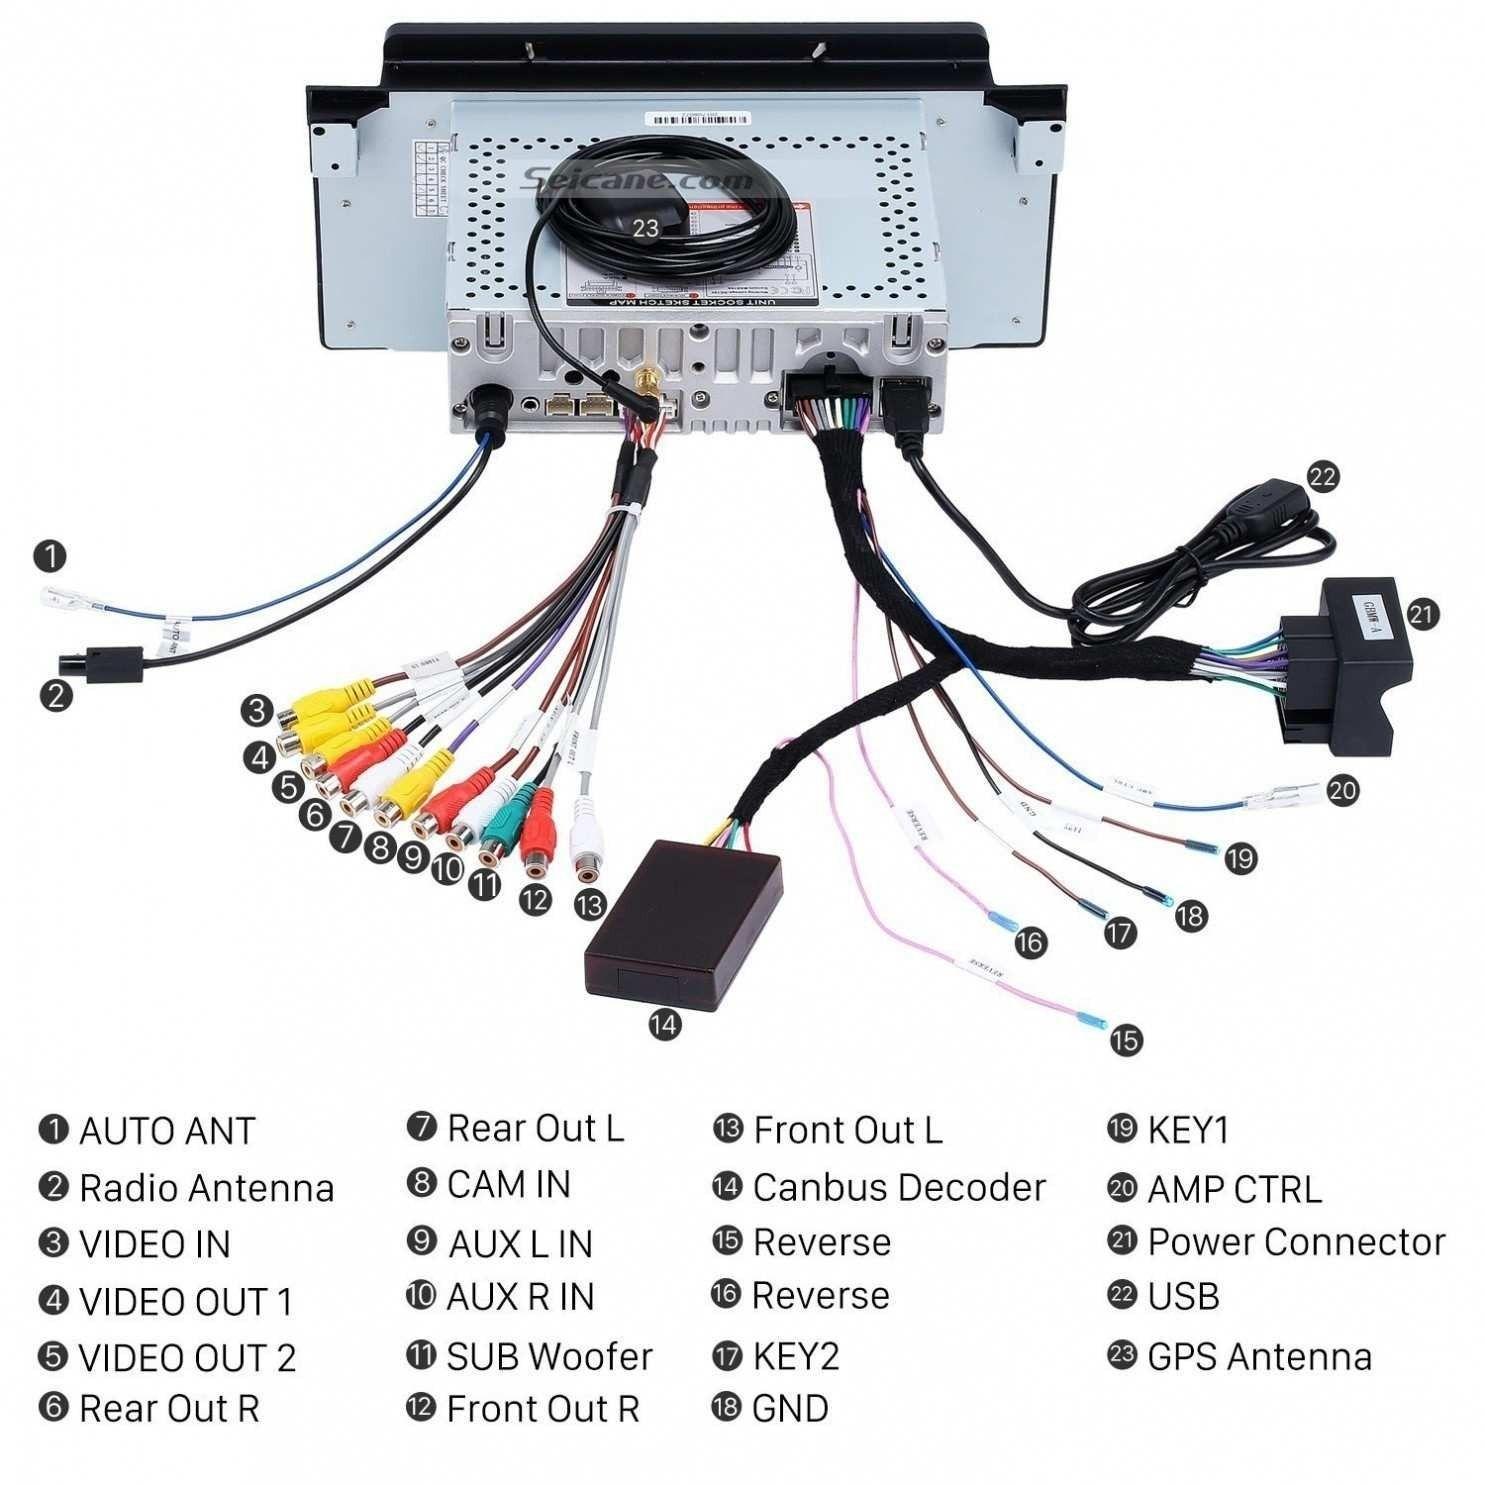 Unique W211 Amplifier Wiring Diagram Car Antenna Structured Wiring House Wiring